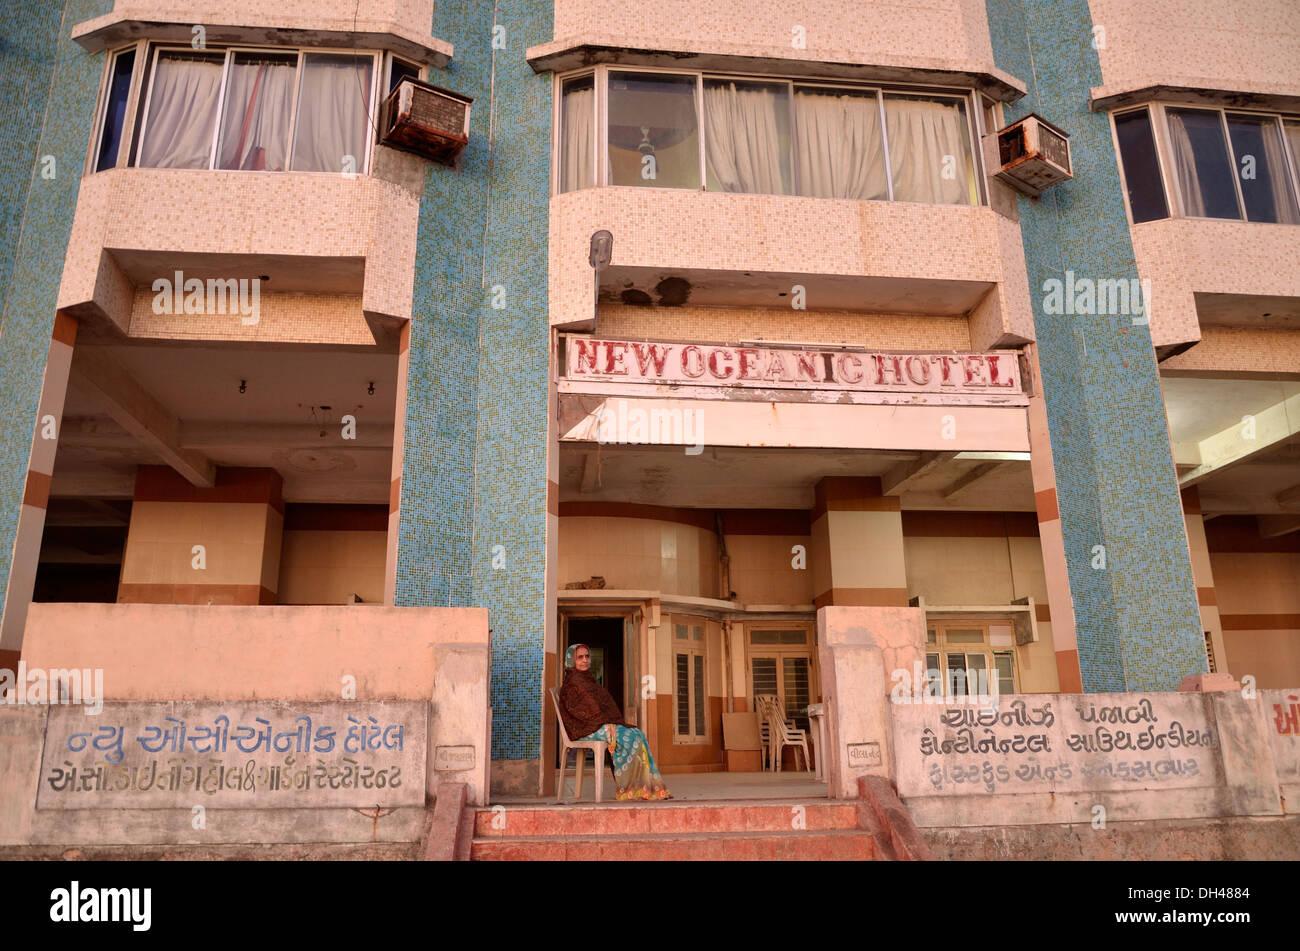 new oceanic hotel building Porbandar Gujrat India Asia - Stock Image